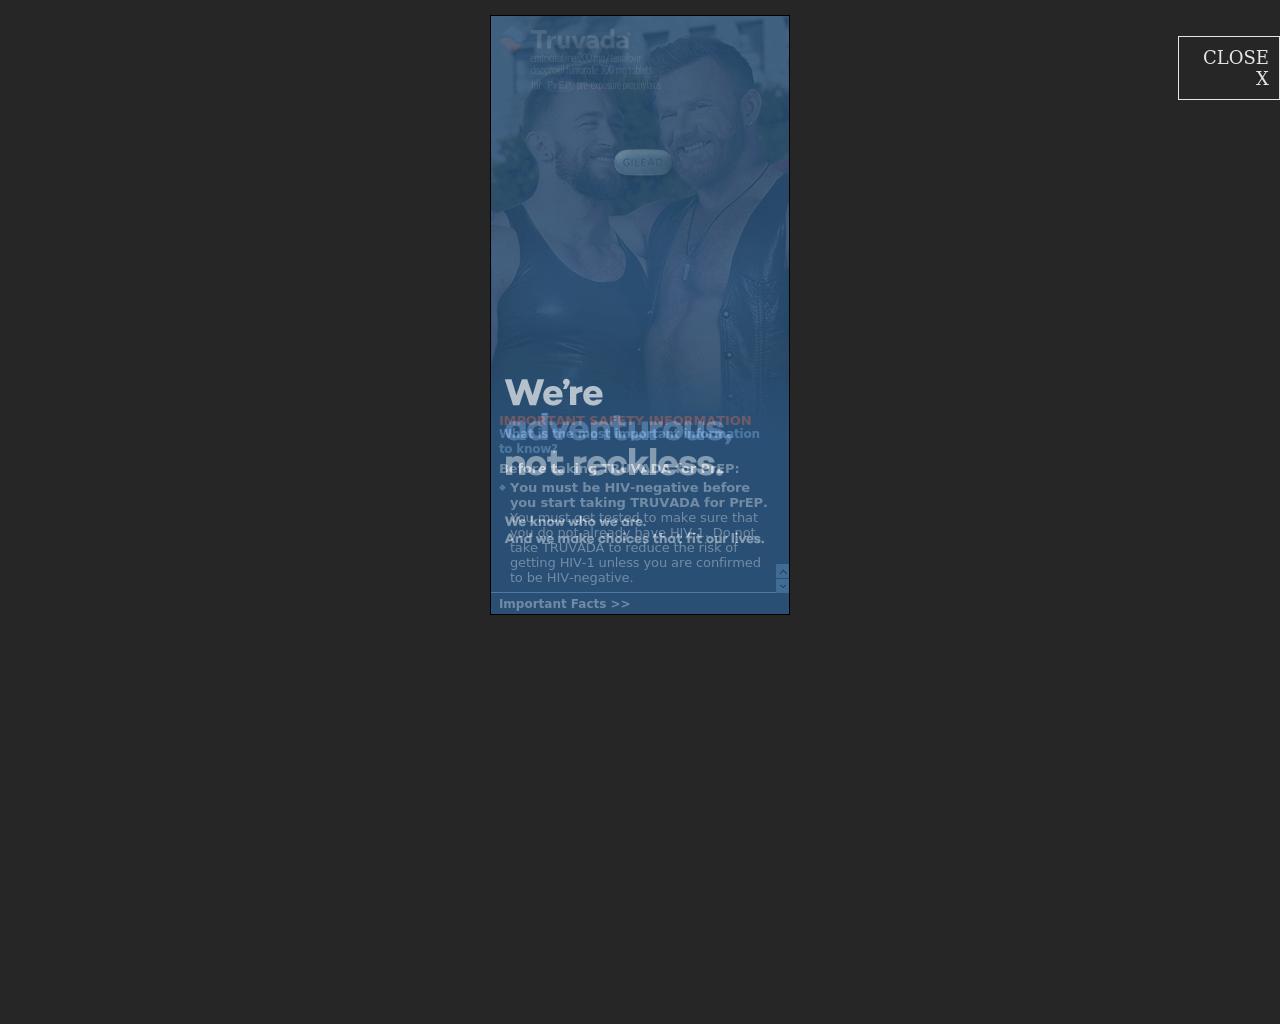 Towleroad-Advertising-Reviews-Pricing